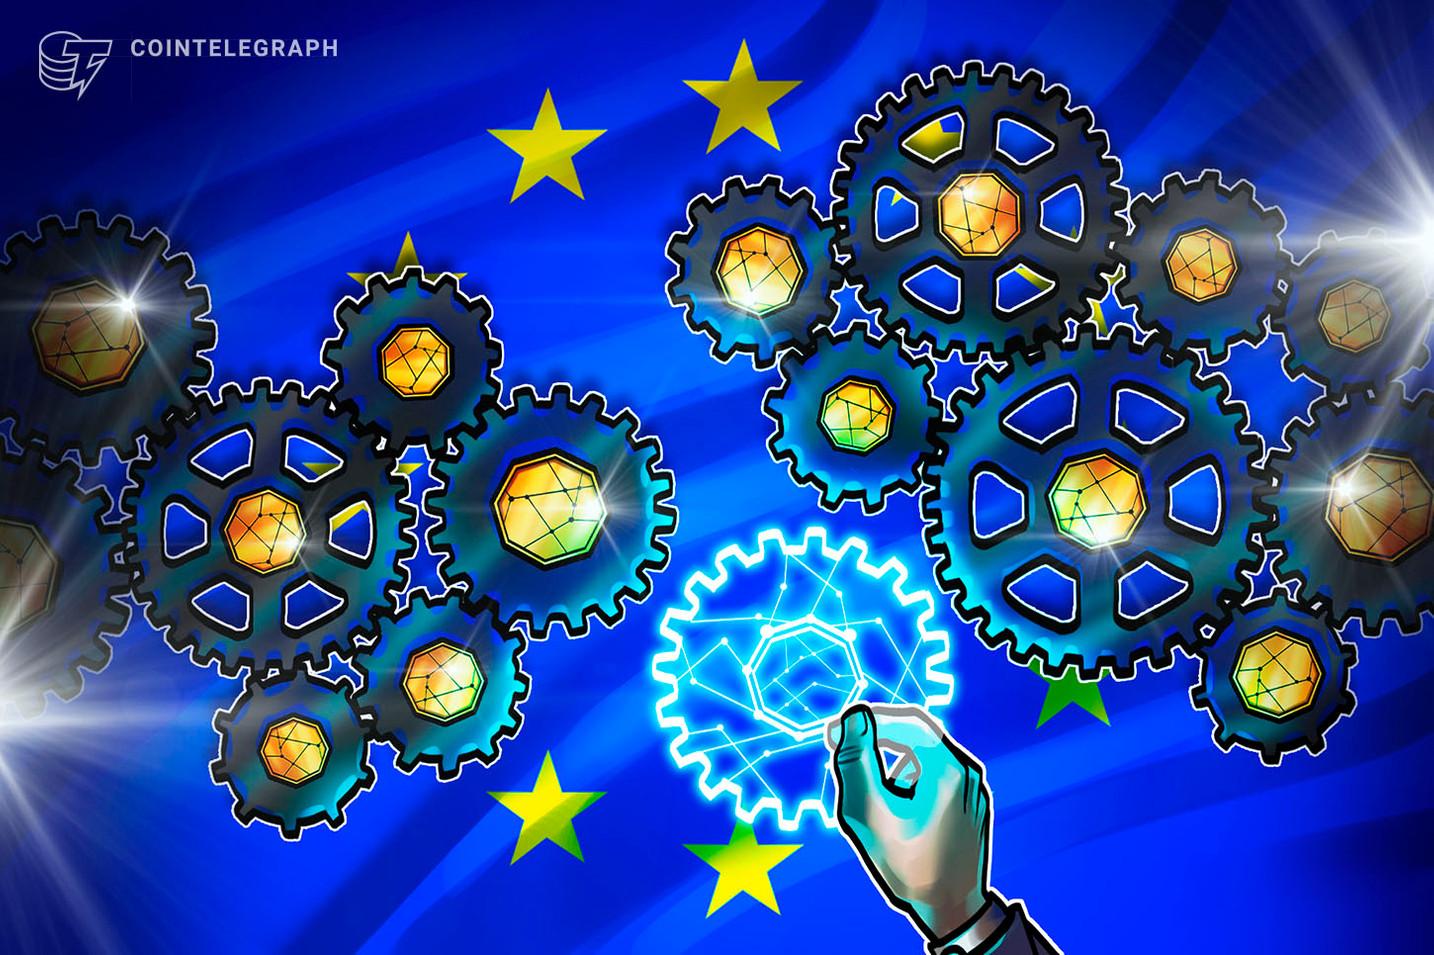 Kerajaan Perancis mendorong satu agensi untuk mengatur crypto di seluruh EU